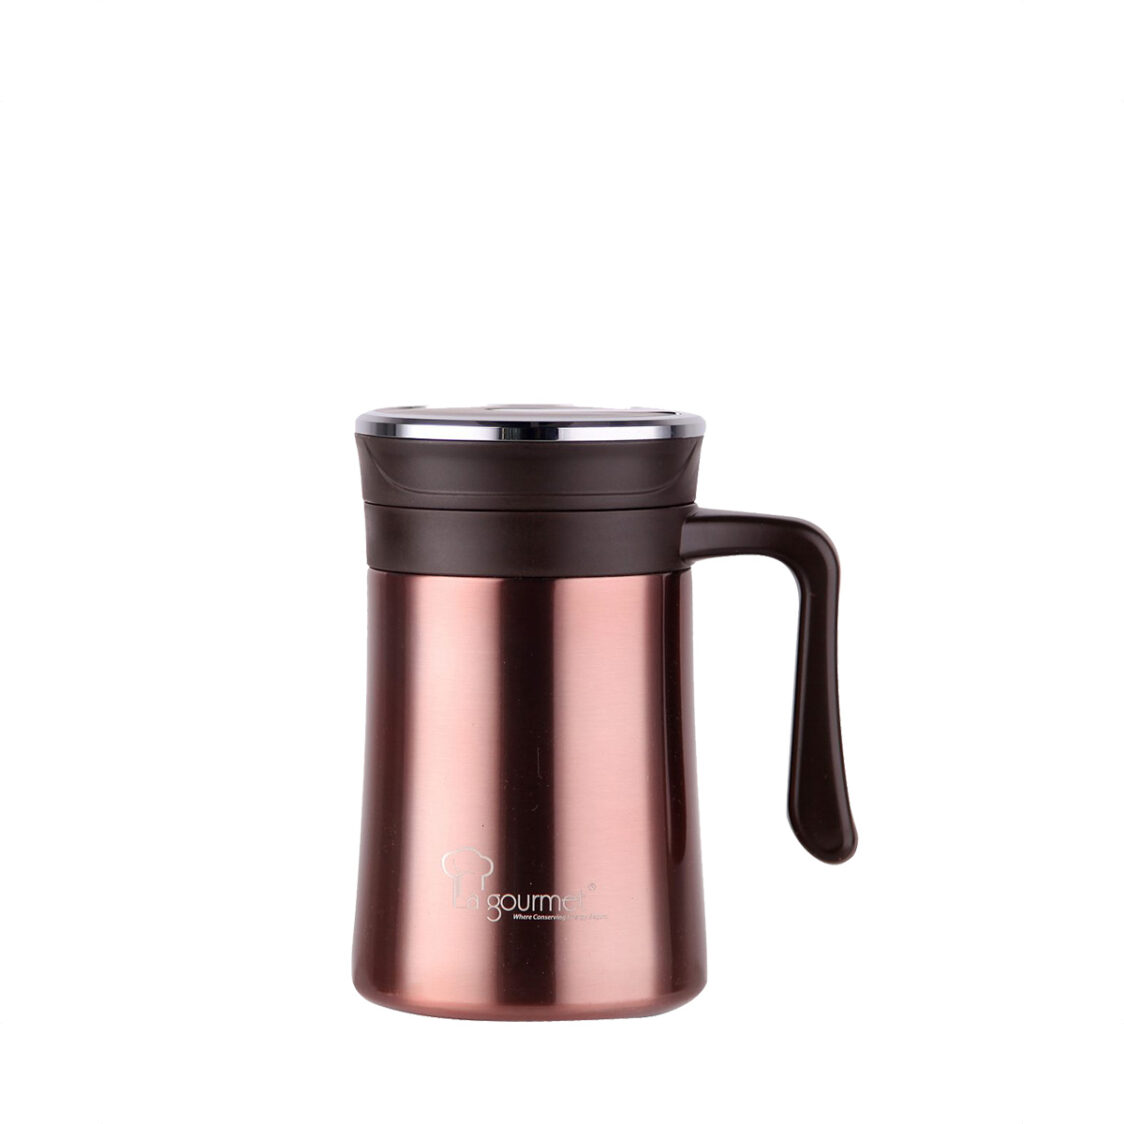 La Gourmet Rose Gold Collection 05L Thermal Mug LGRGC363909